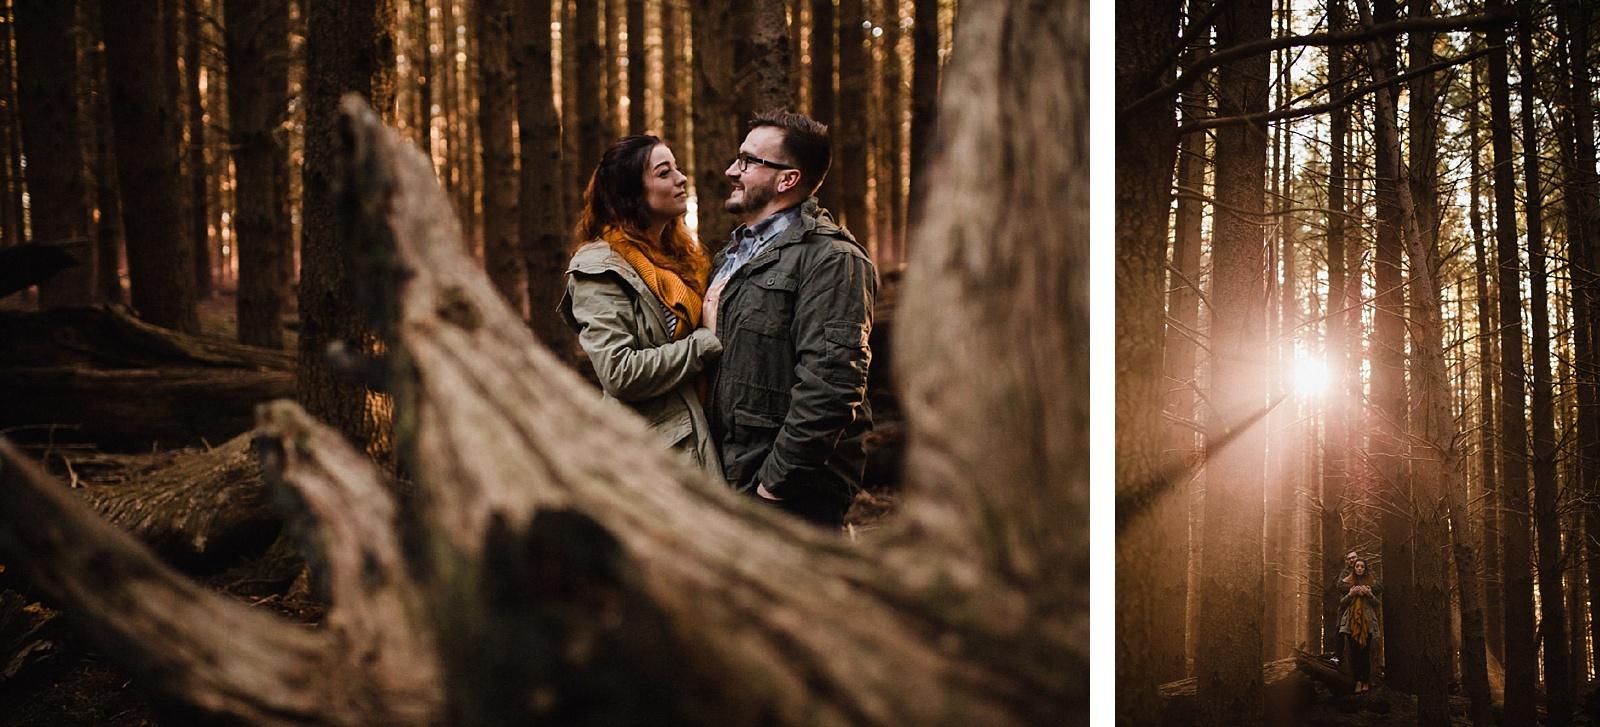 023Barrington Tops Elopement Photographer in Hunter Valley Wedding Photography Newcastle NSW Bryce Noone.jpg